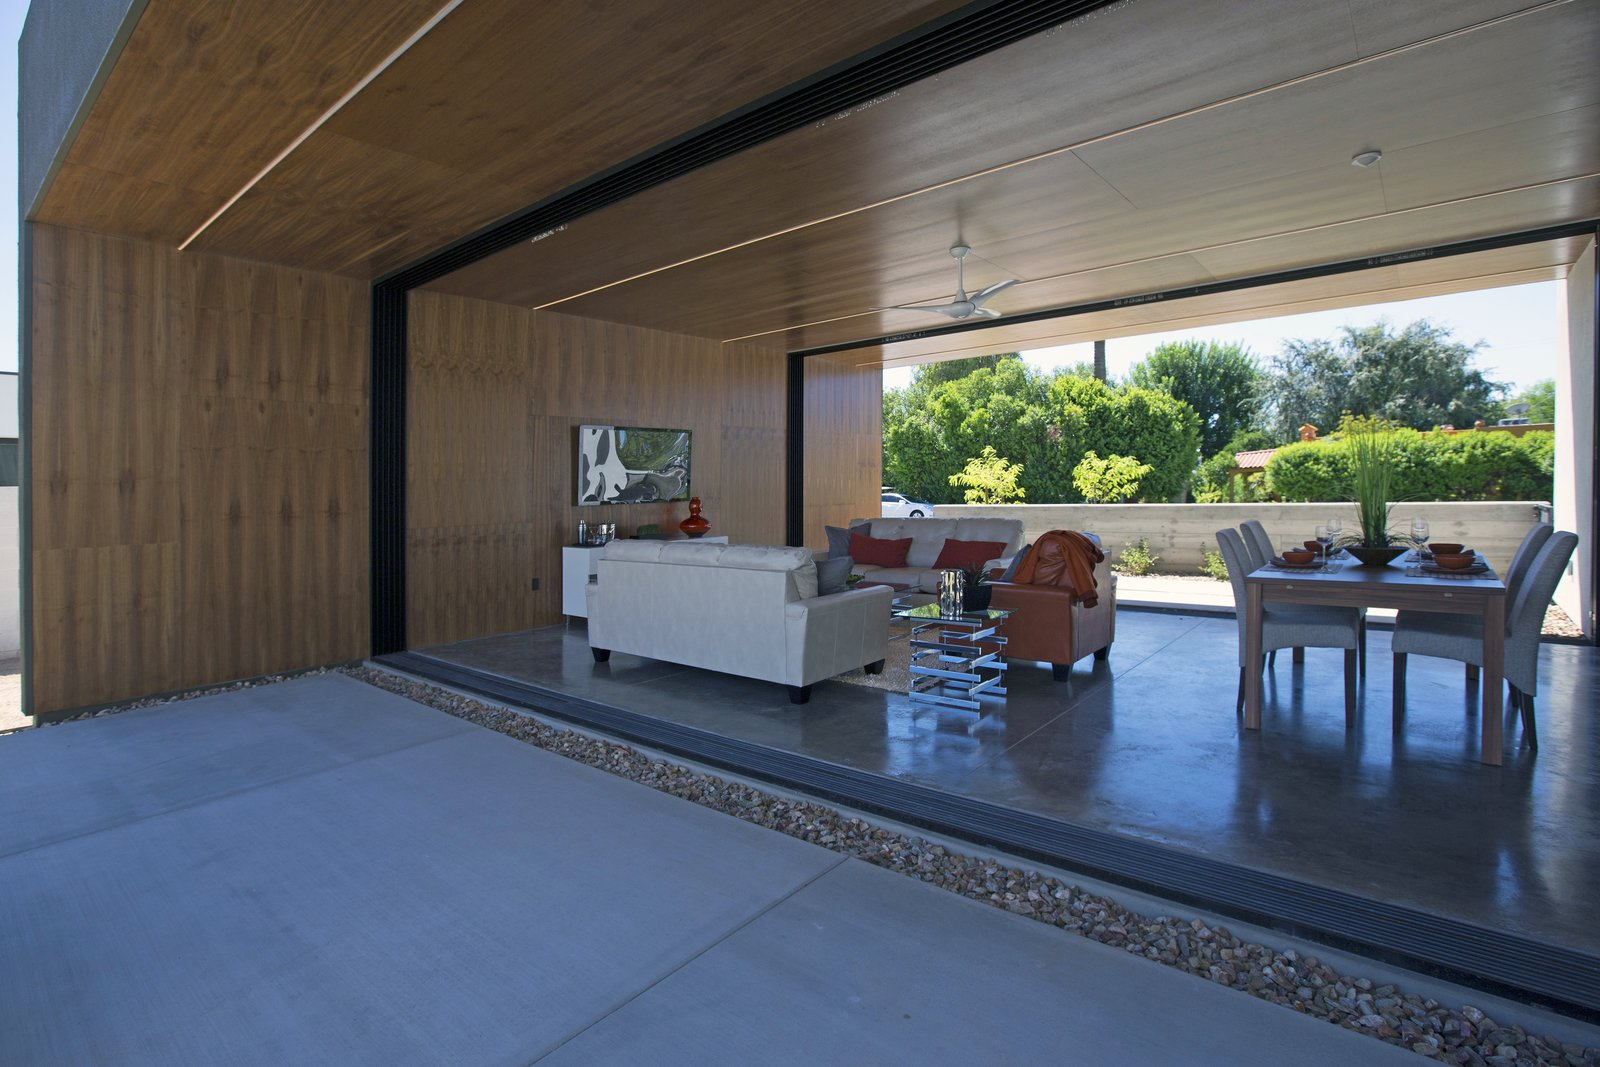 Trees, Back Yard, Concrete Patio, Porch, Deck, Ceiling Lighting, Concrete Floor, Grass, and Living Room #modern #minimal #indooroutdoor #phoenix #arizona  Best Photos from Glass Walls • Windows • Sliding Walls